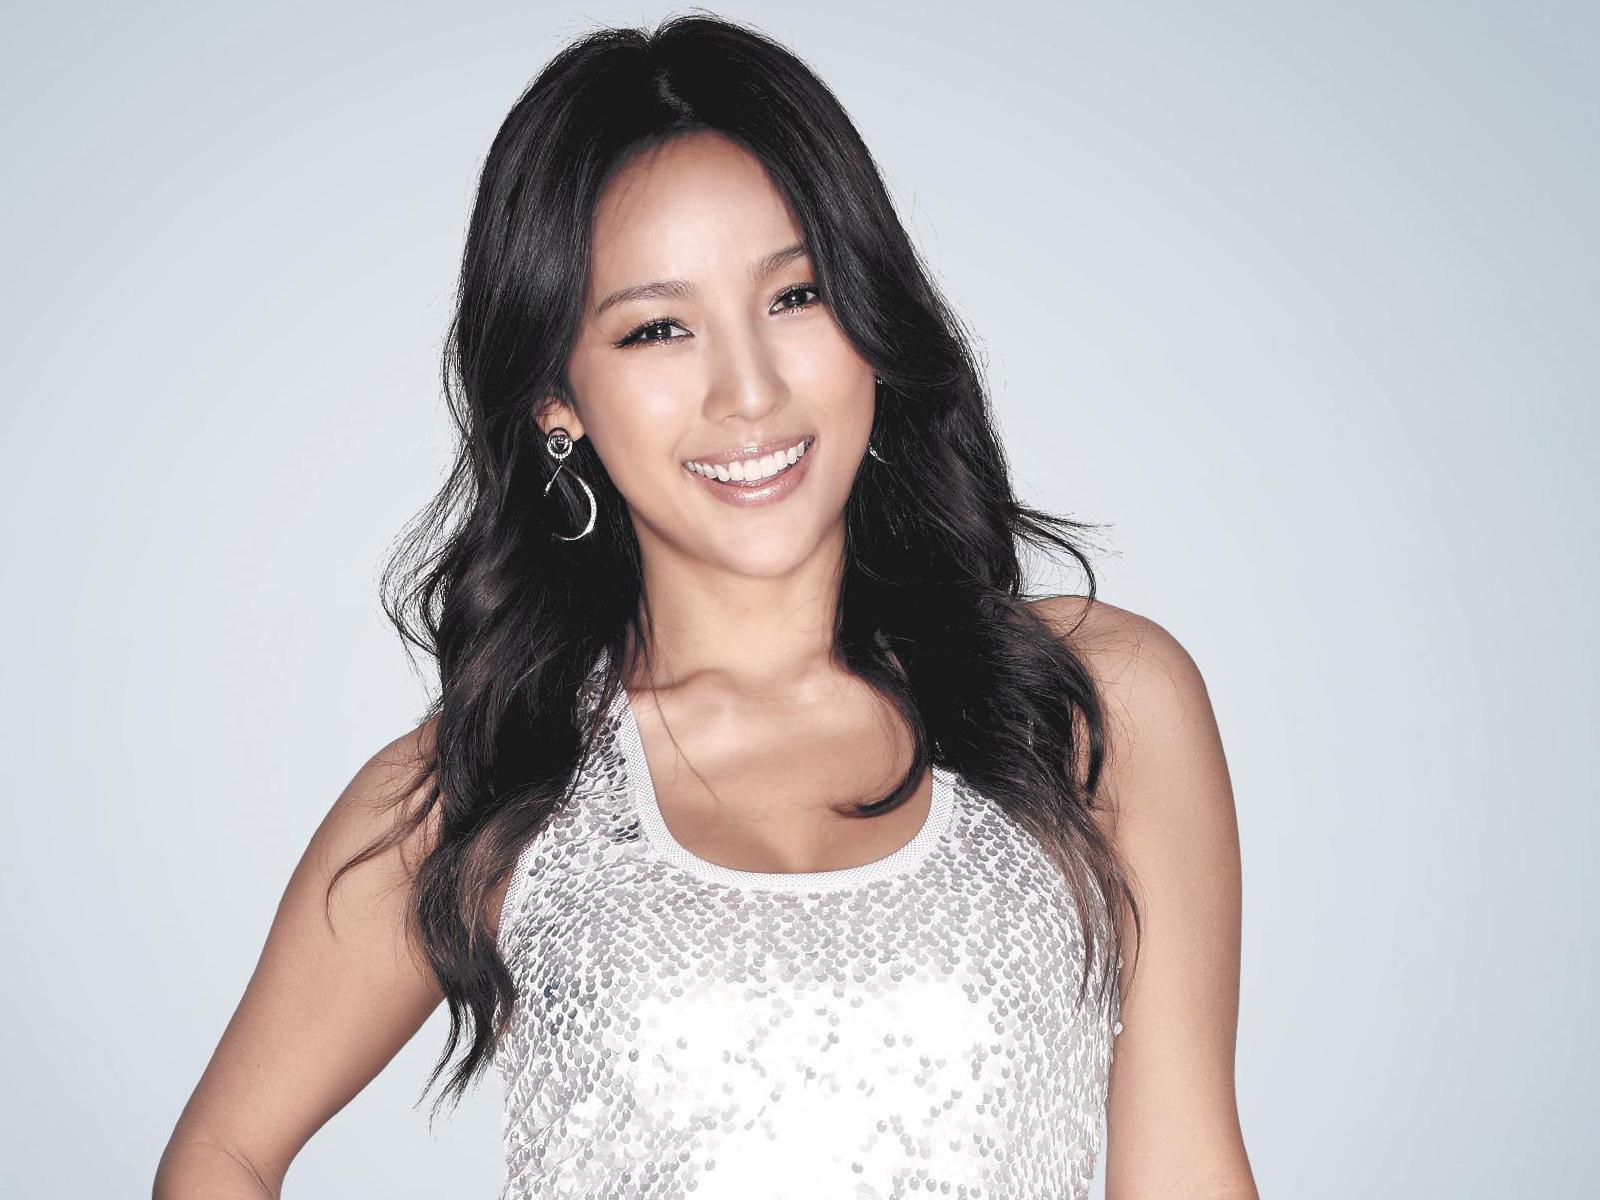 [Gallery] Happy Birthday to K-Pop's Sexy Diva, Lee Hyori!